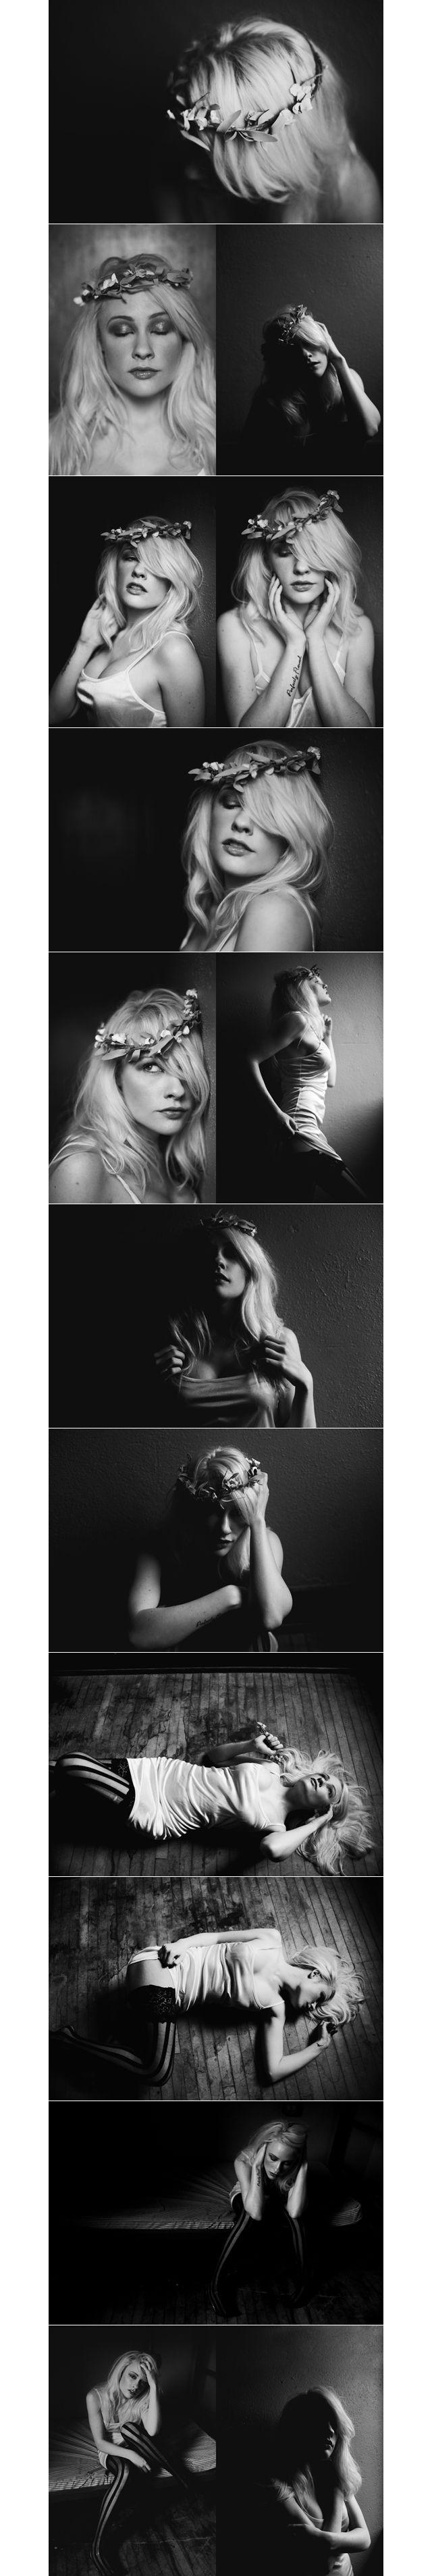 Reva May | | | Photography|Fashion Photography Inspiration